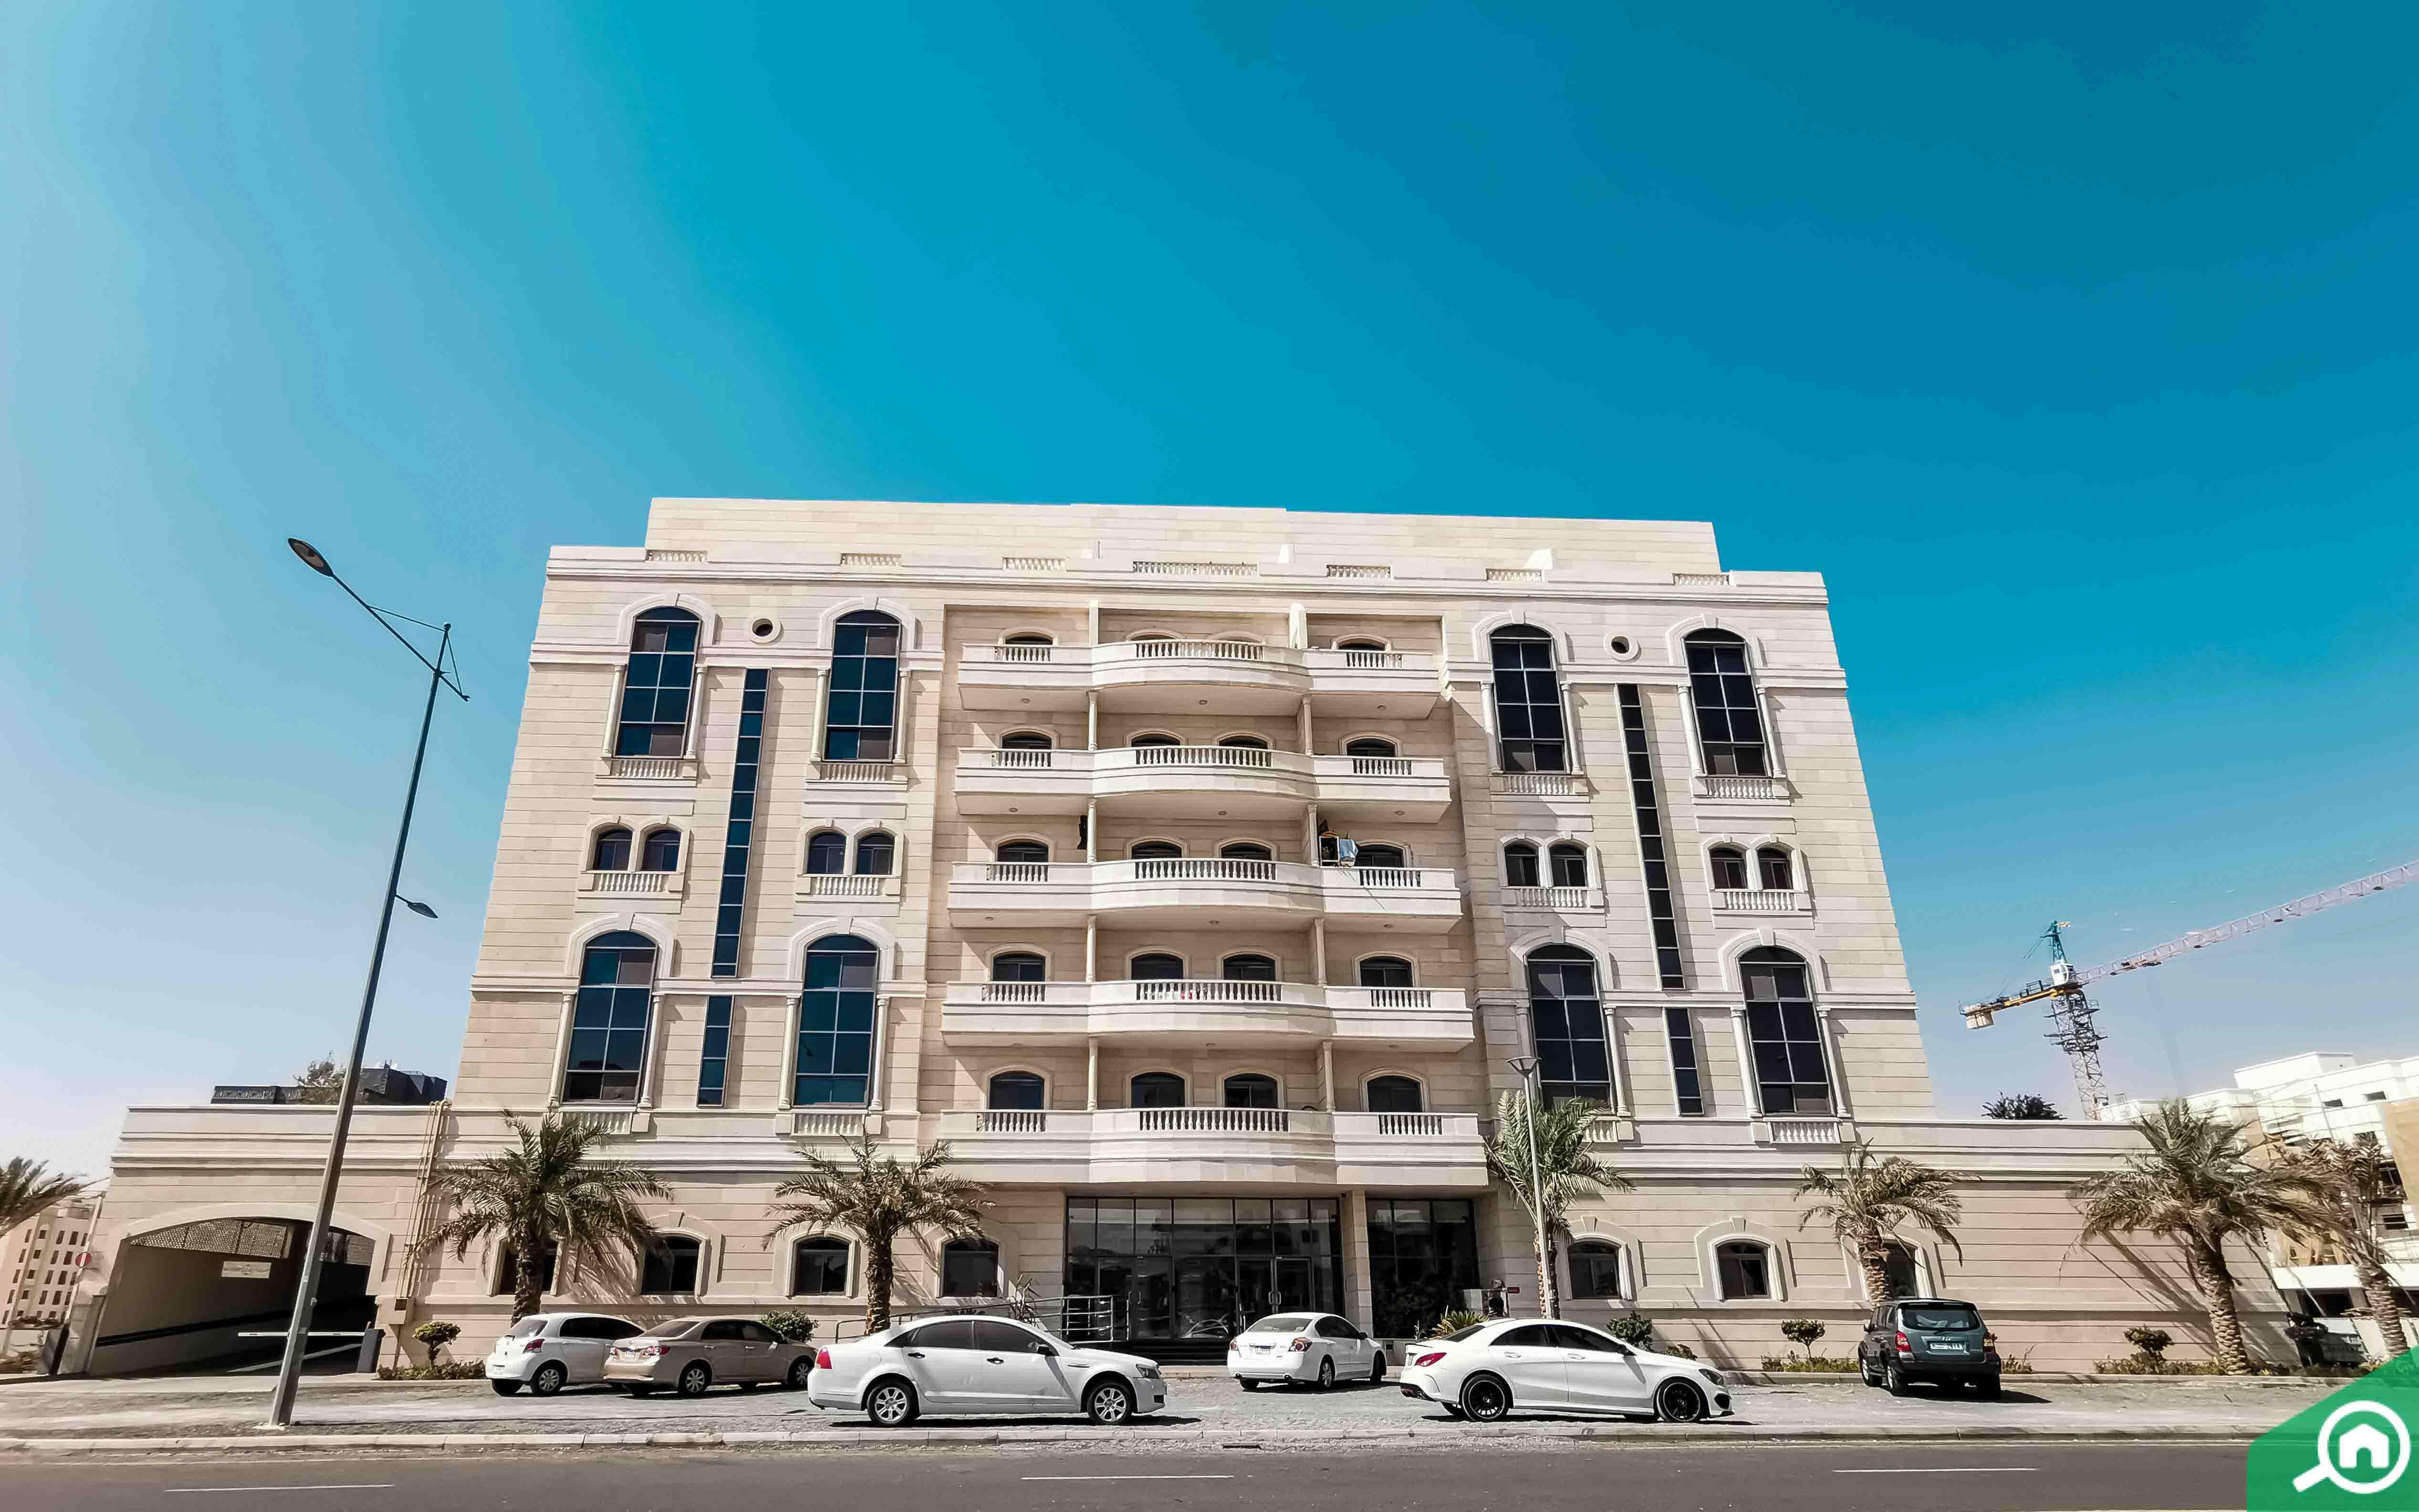 Apartments in Dubai International City 13.01.2020